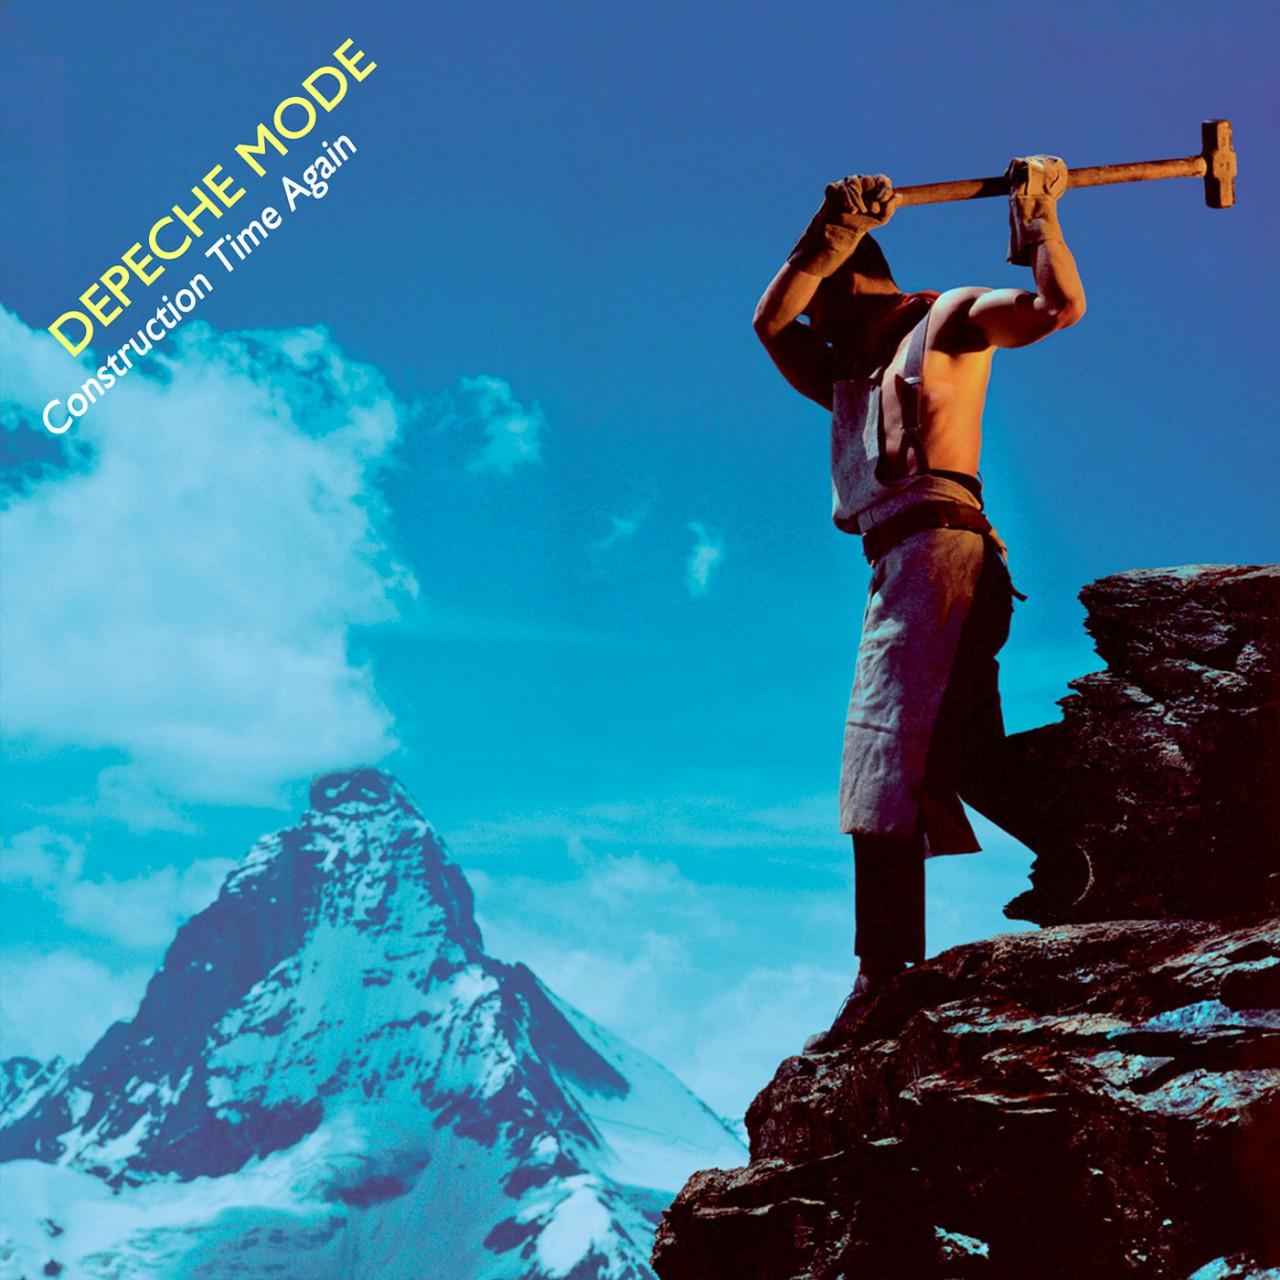 Depeche Mode: Construction Time Again